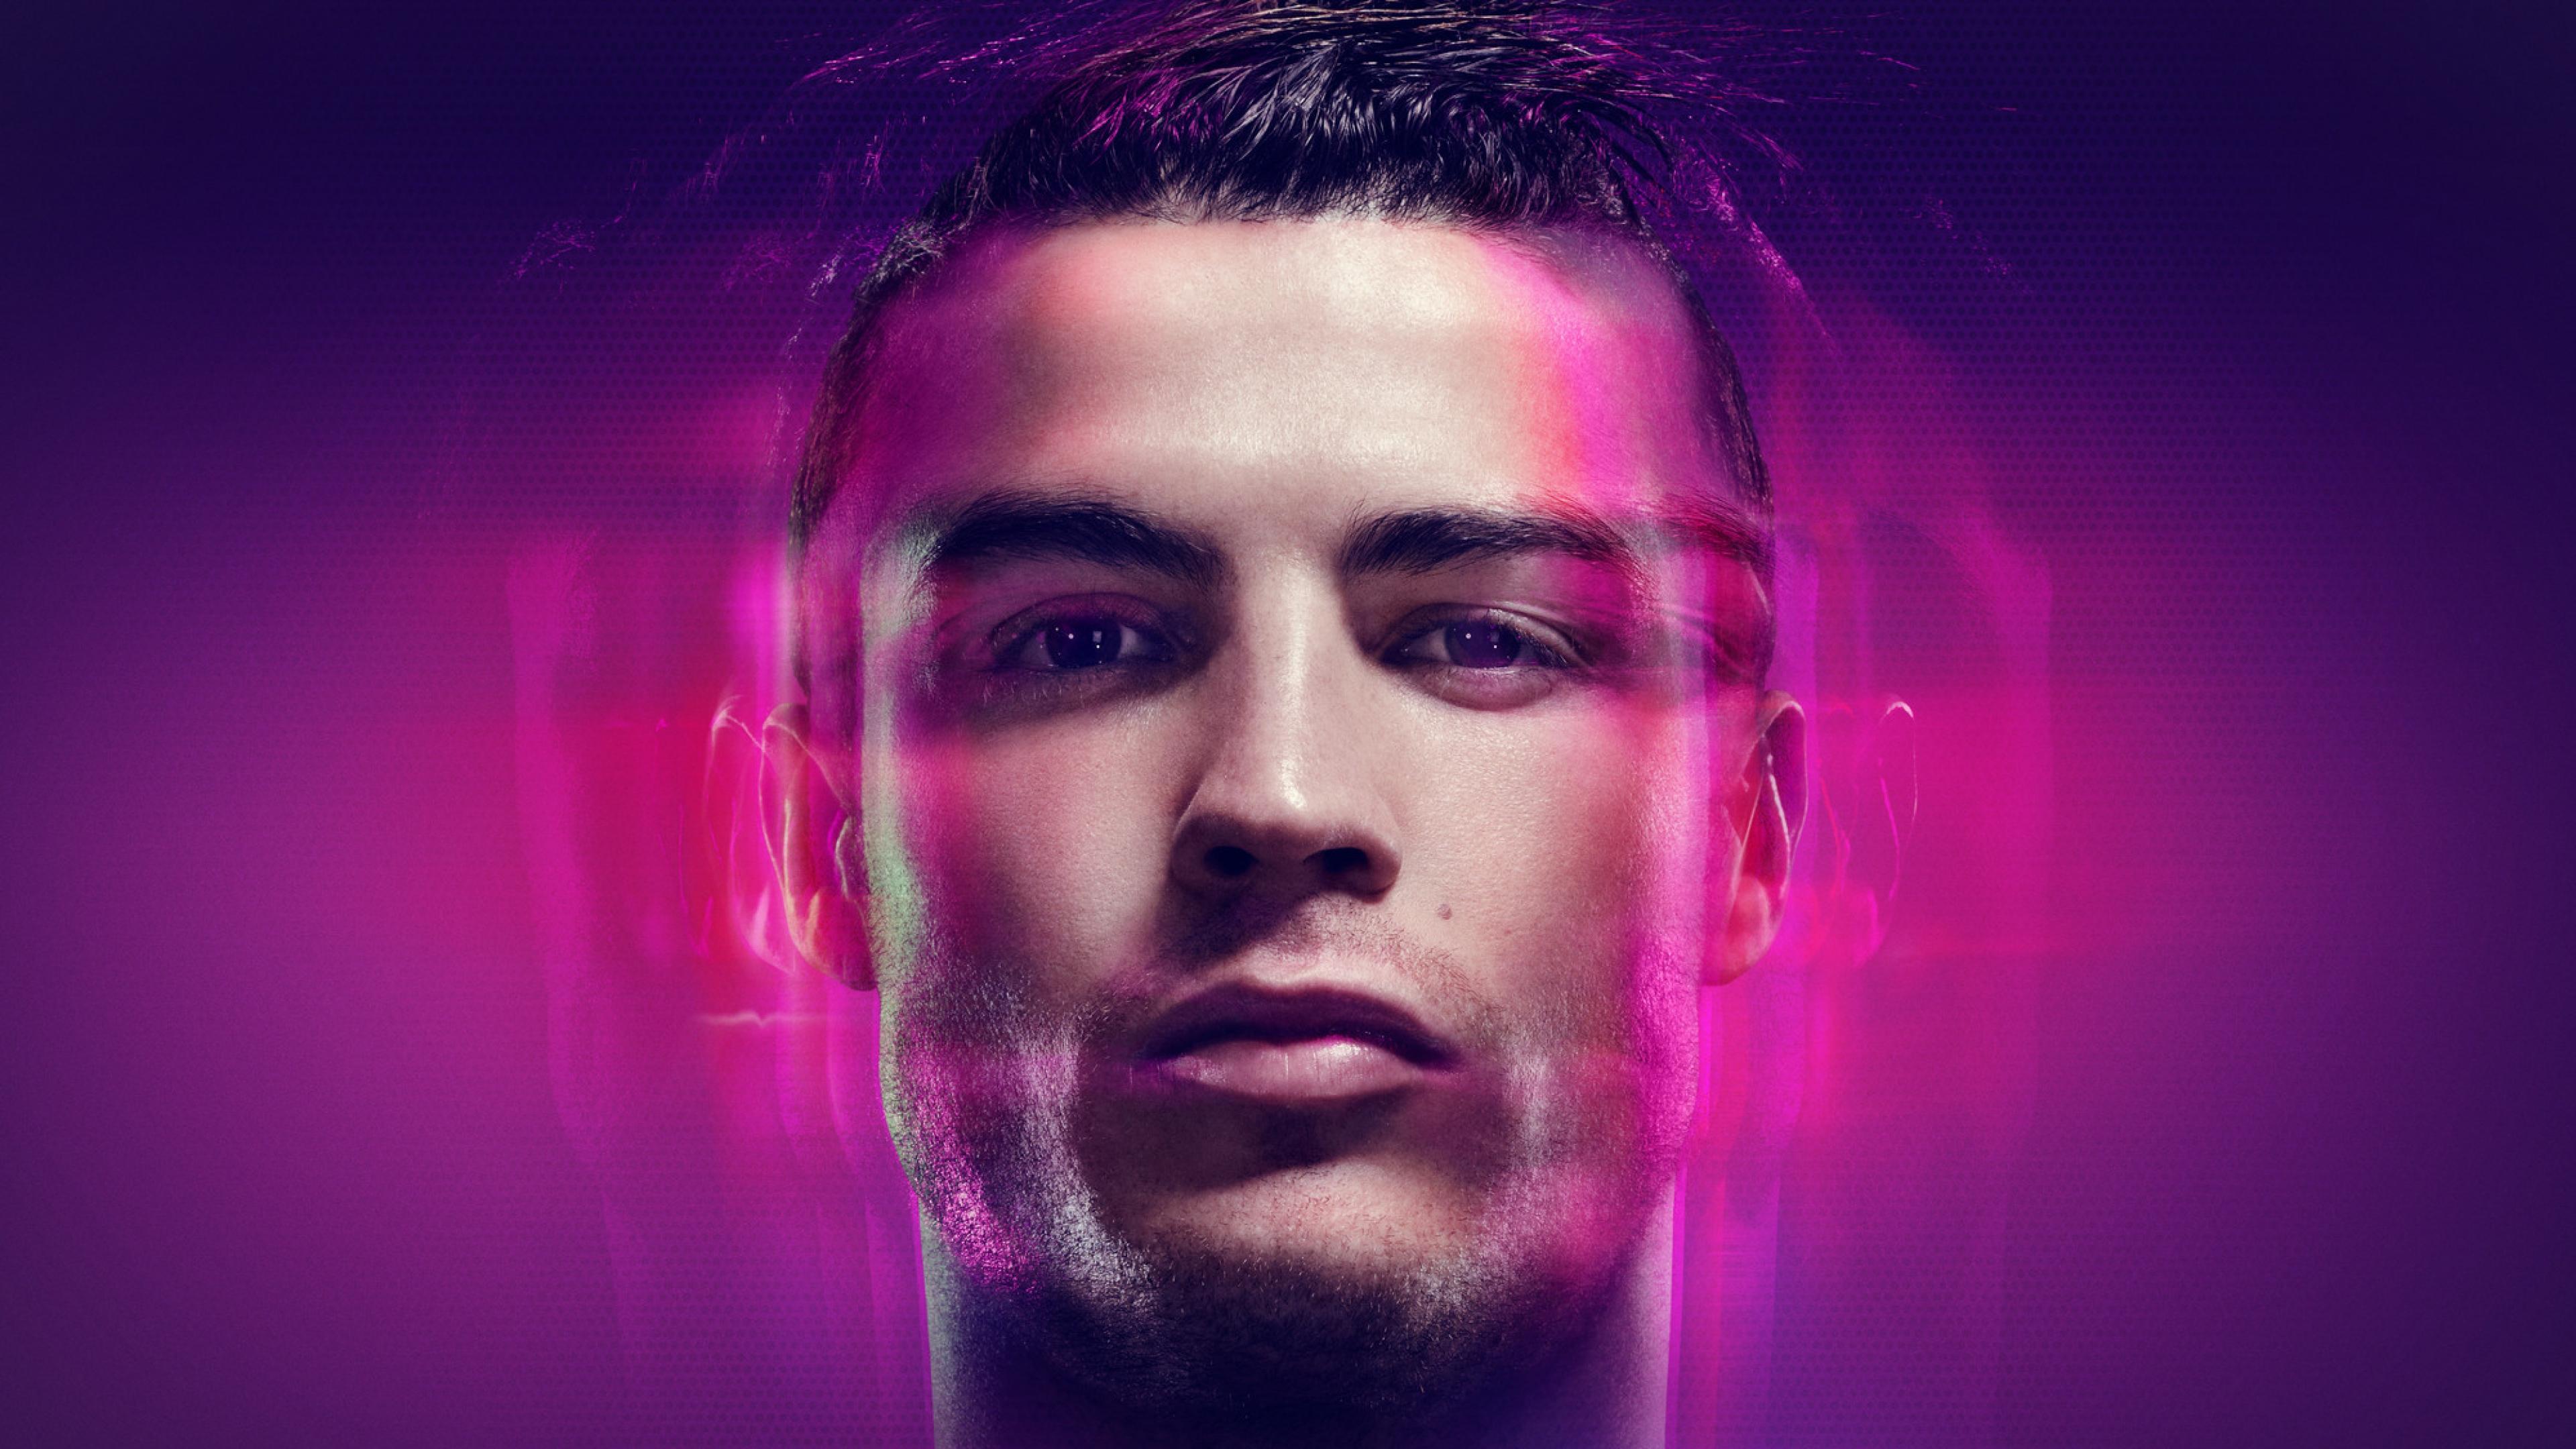 christiano ronaldo 1538786743 - Christiano Ronaldo - sports wallpapers, football wallpapers, christiano ronaldo wallpapers